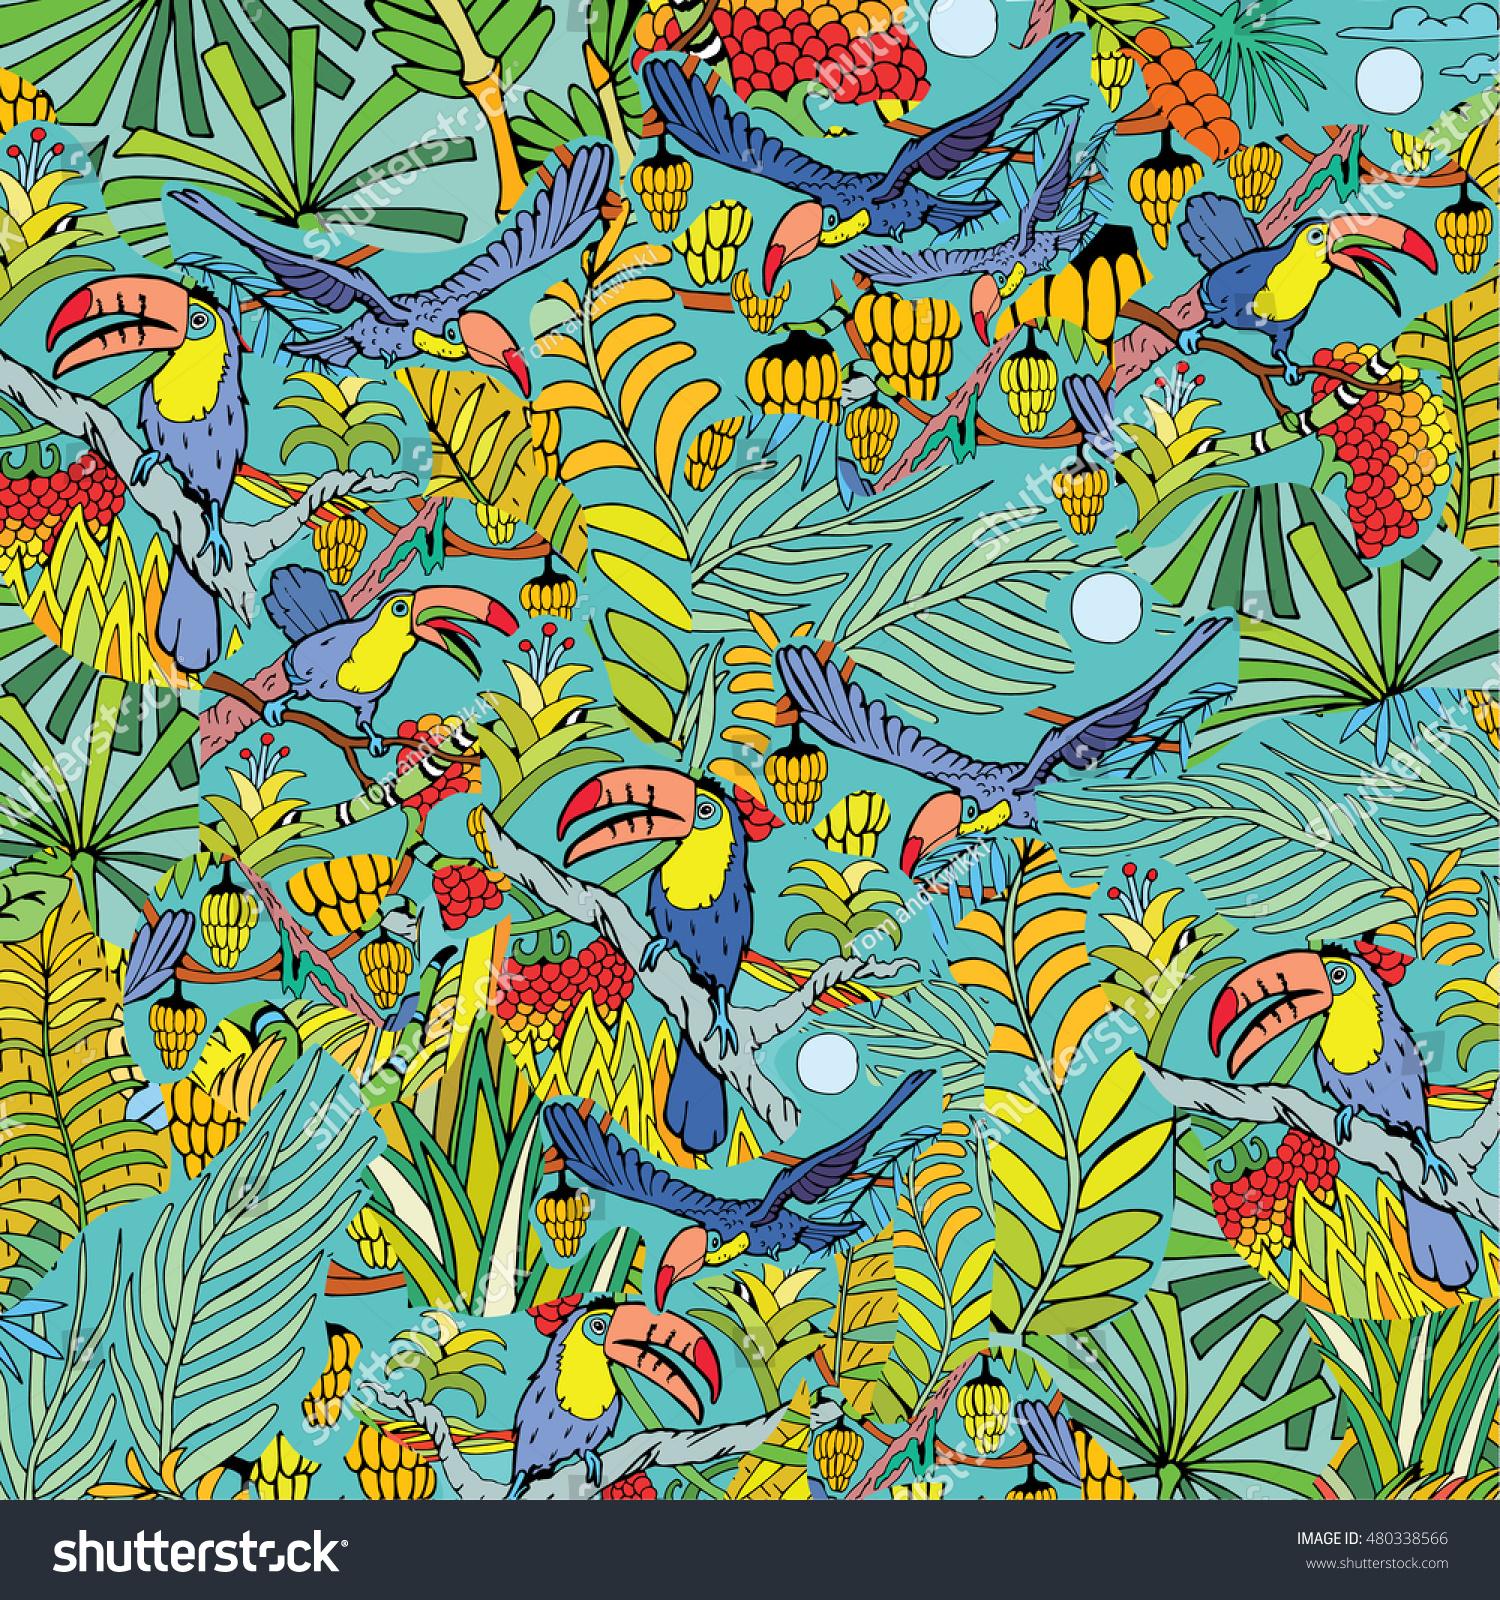 wildlife jungle toucan bird hand drawn stock vector royalty free